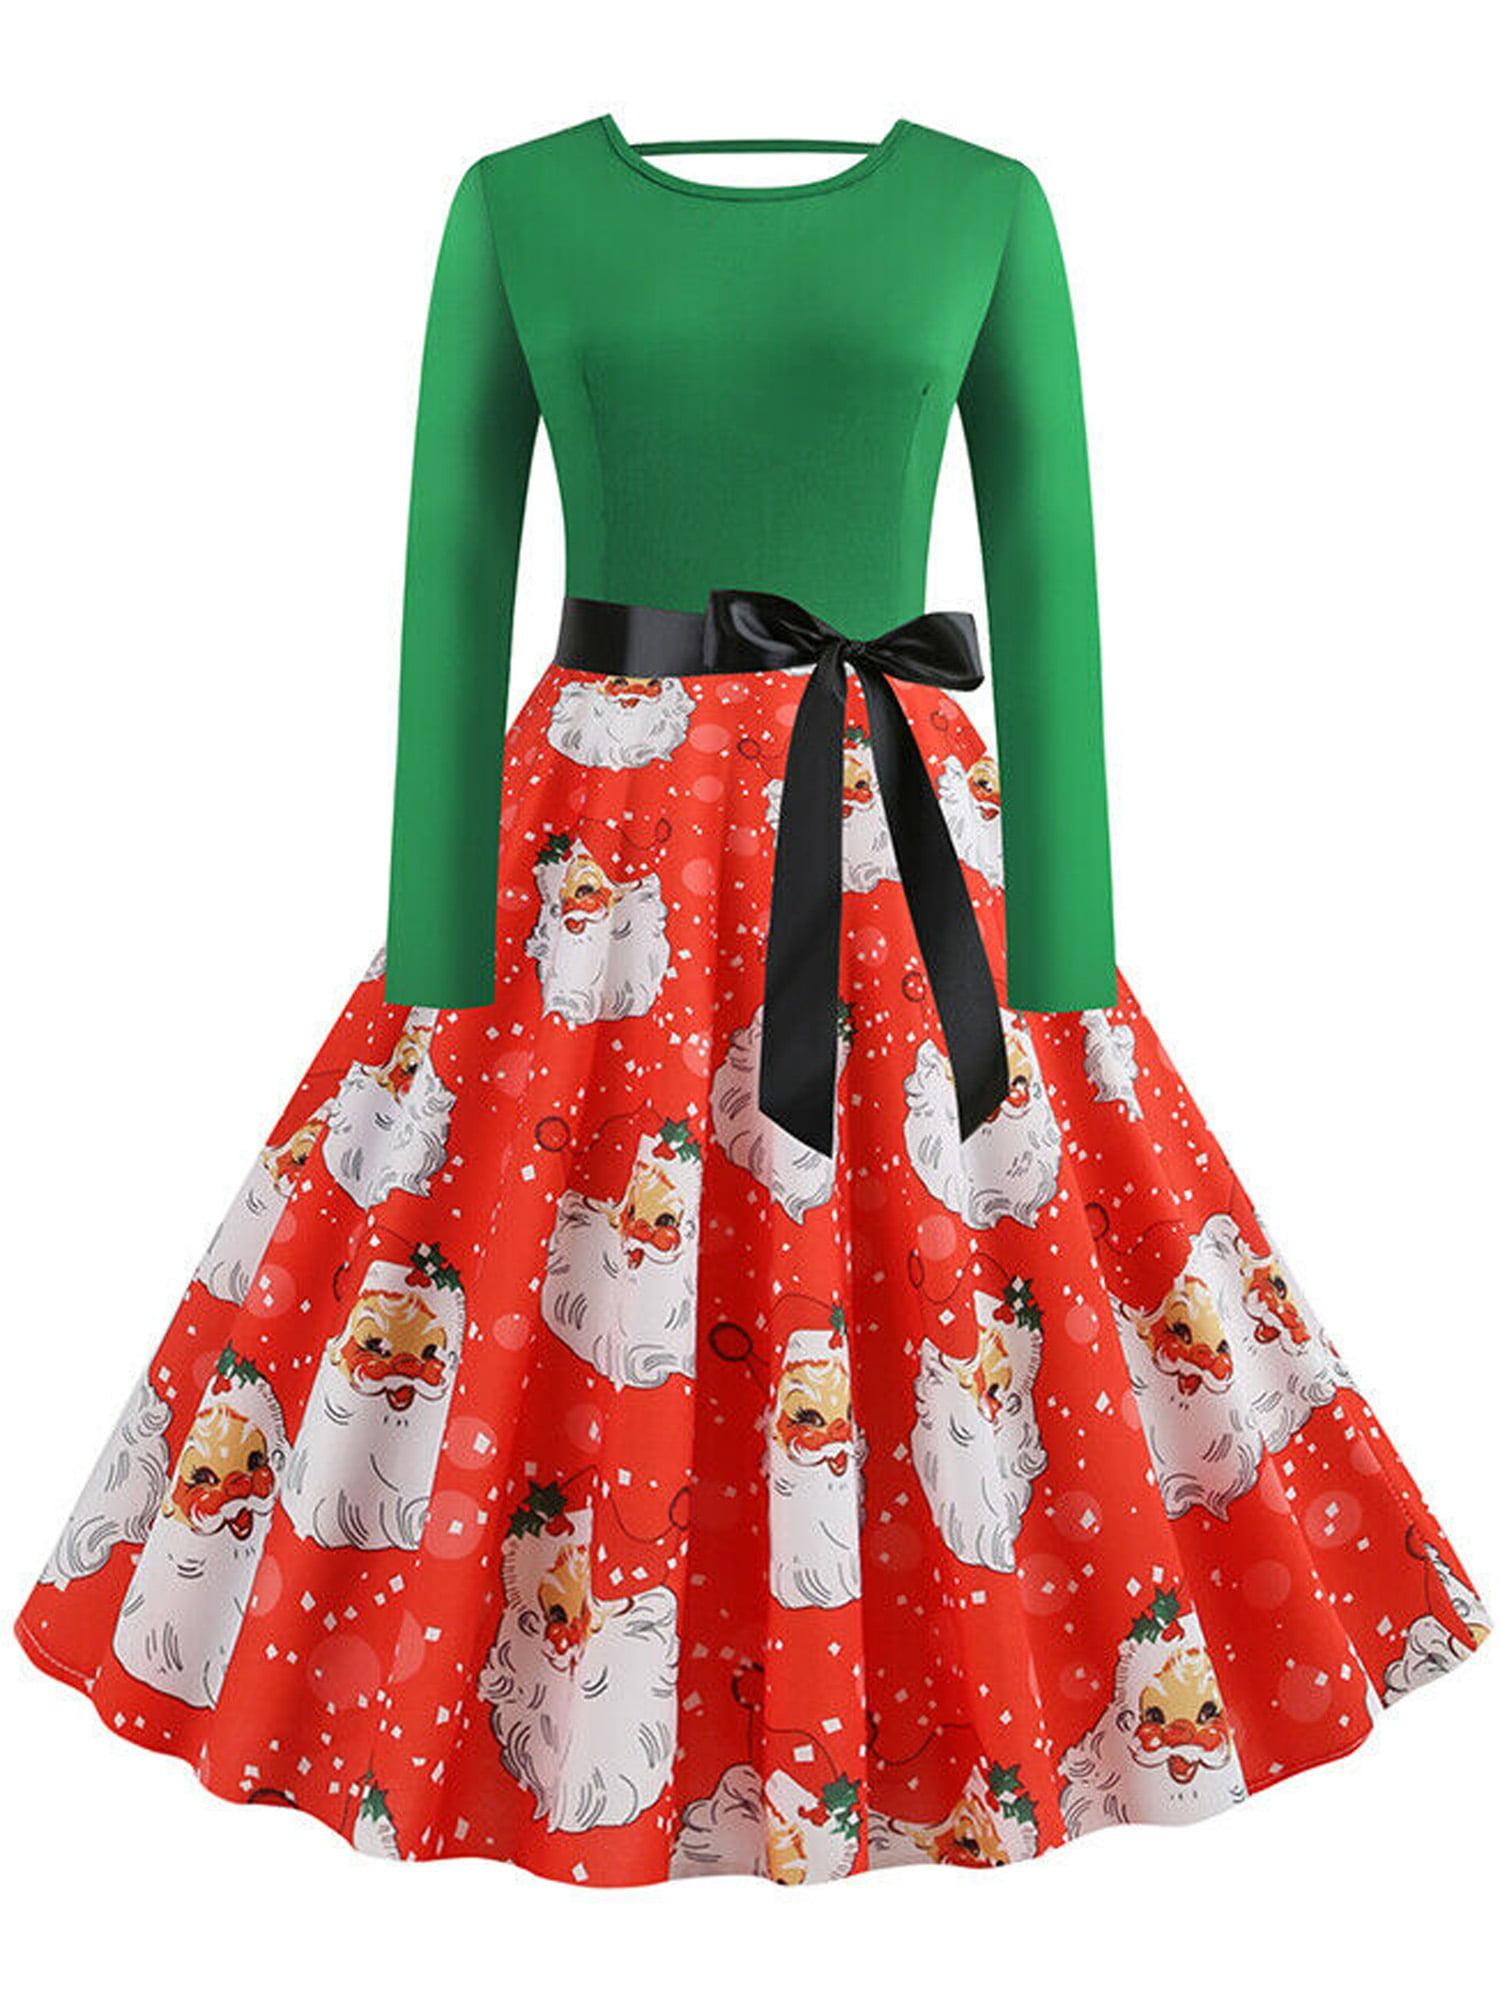 bebiullo - Bebiullo Women Christmas Skater Swing Dress ...